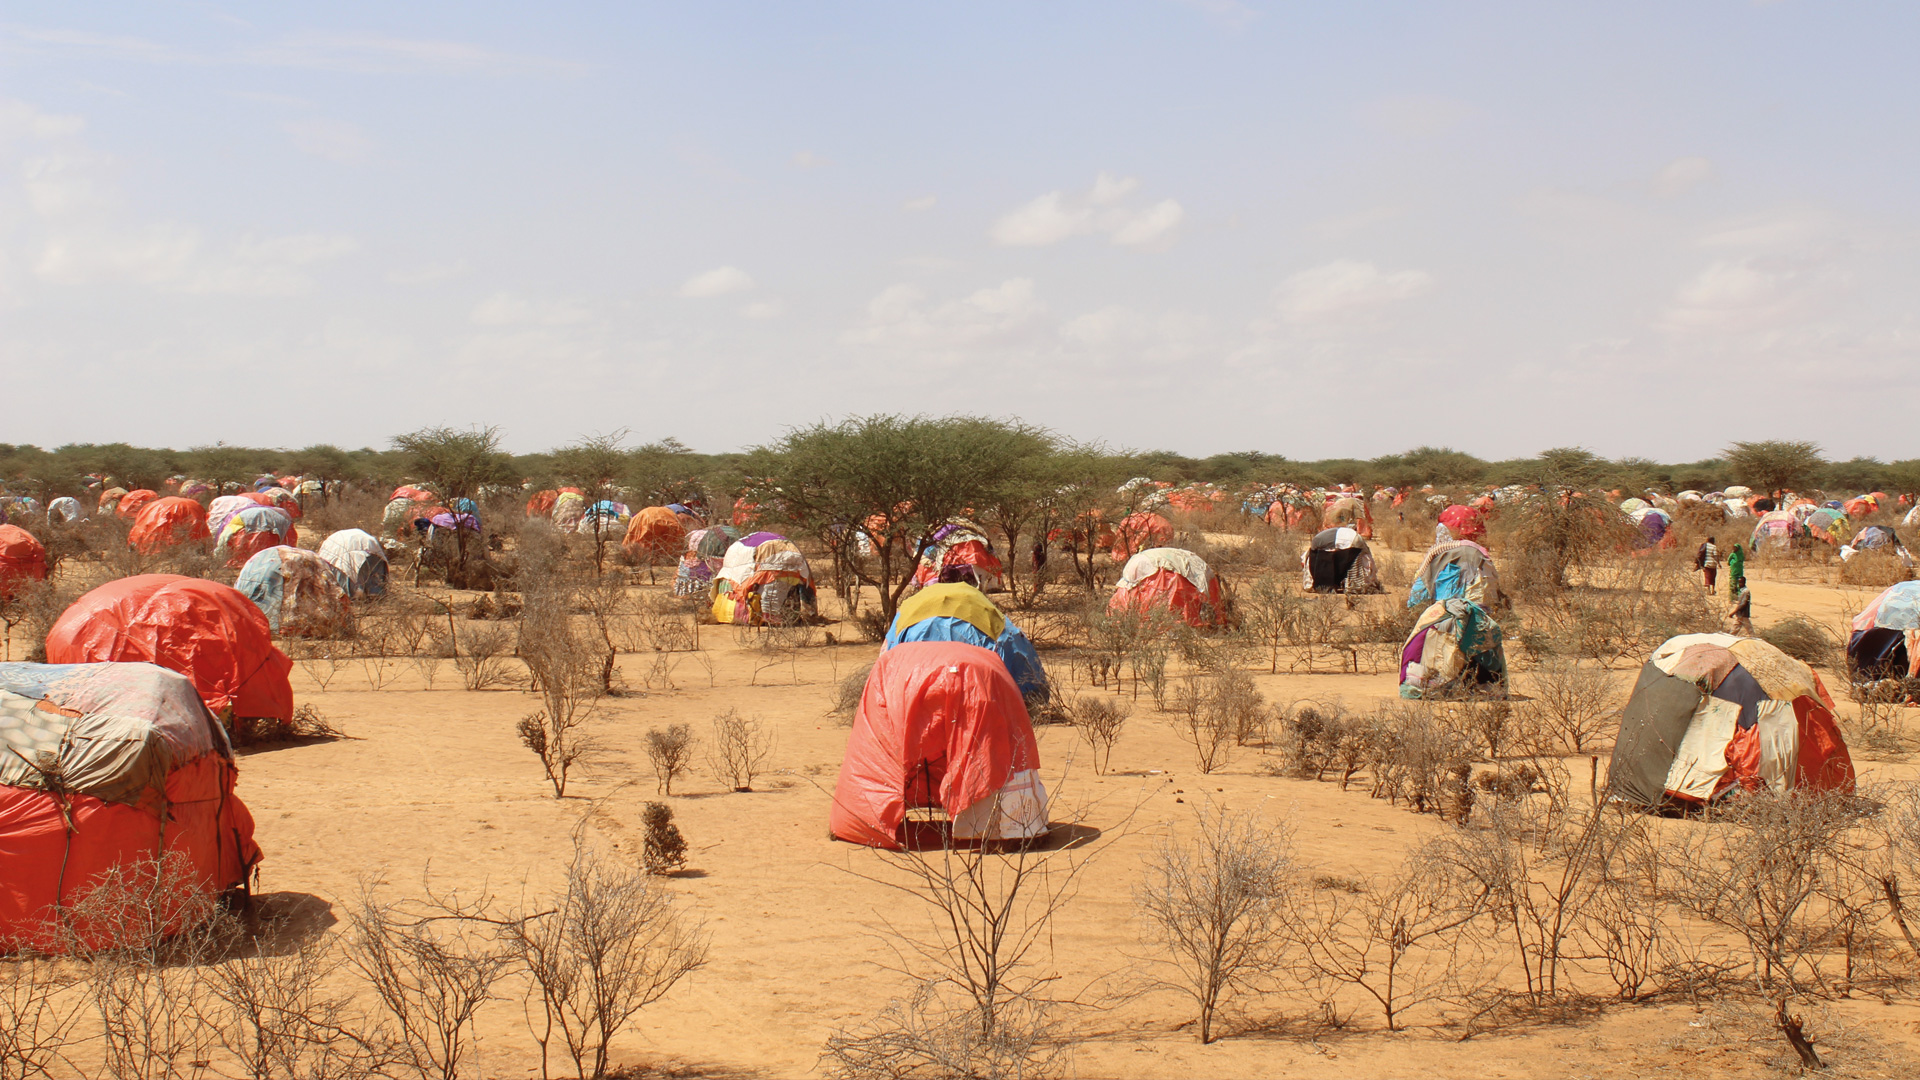 Die Dürre in Ostafrika